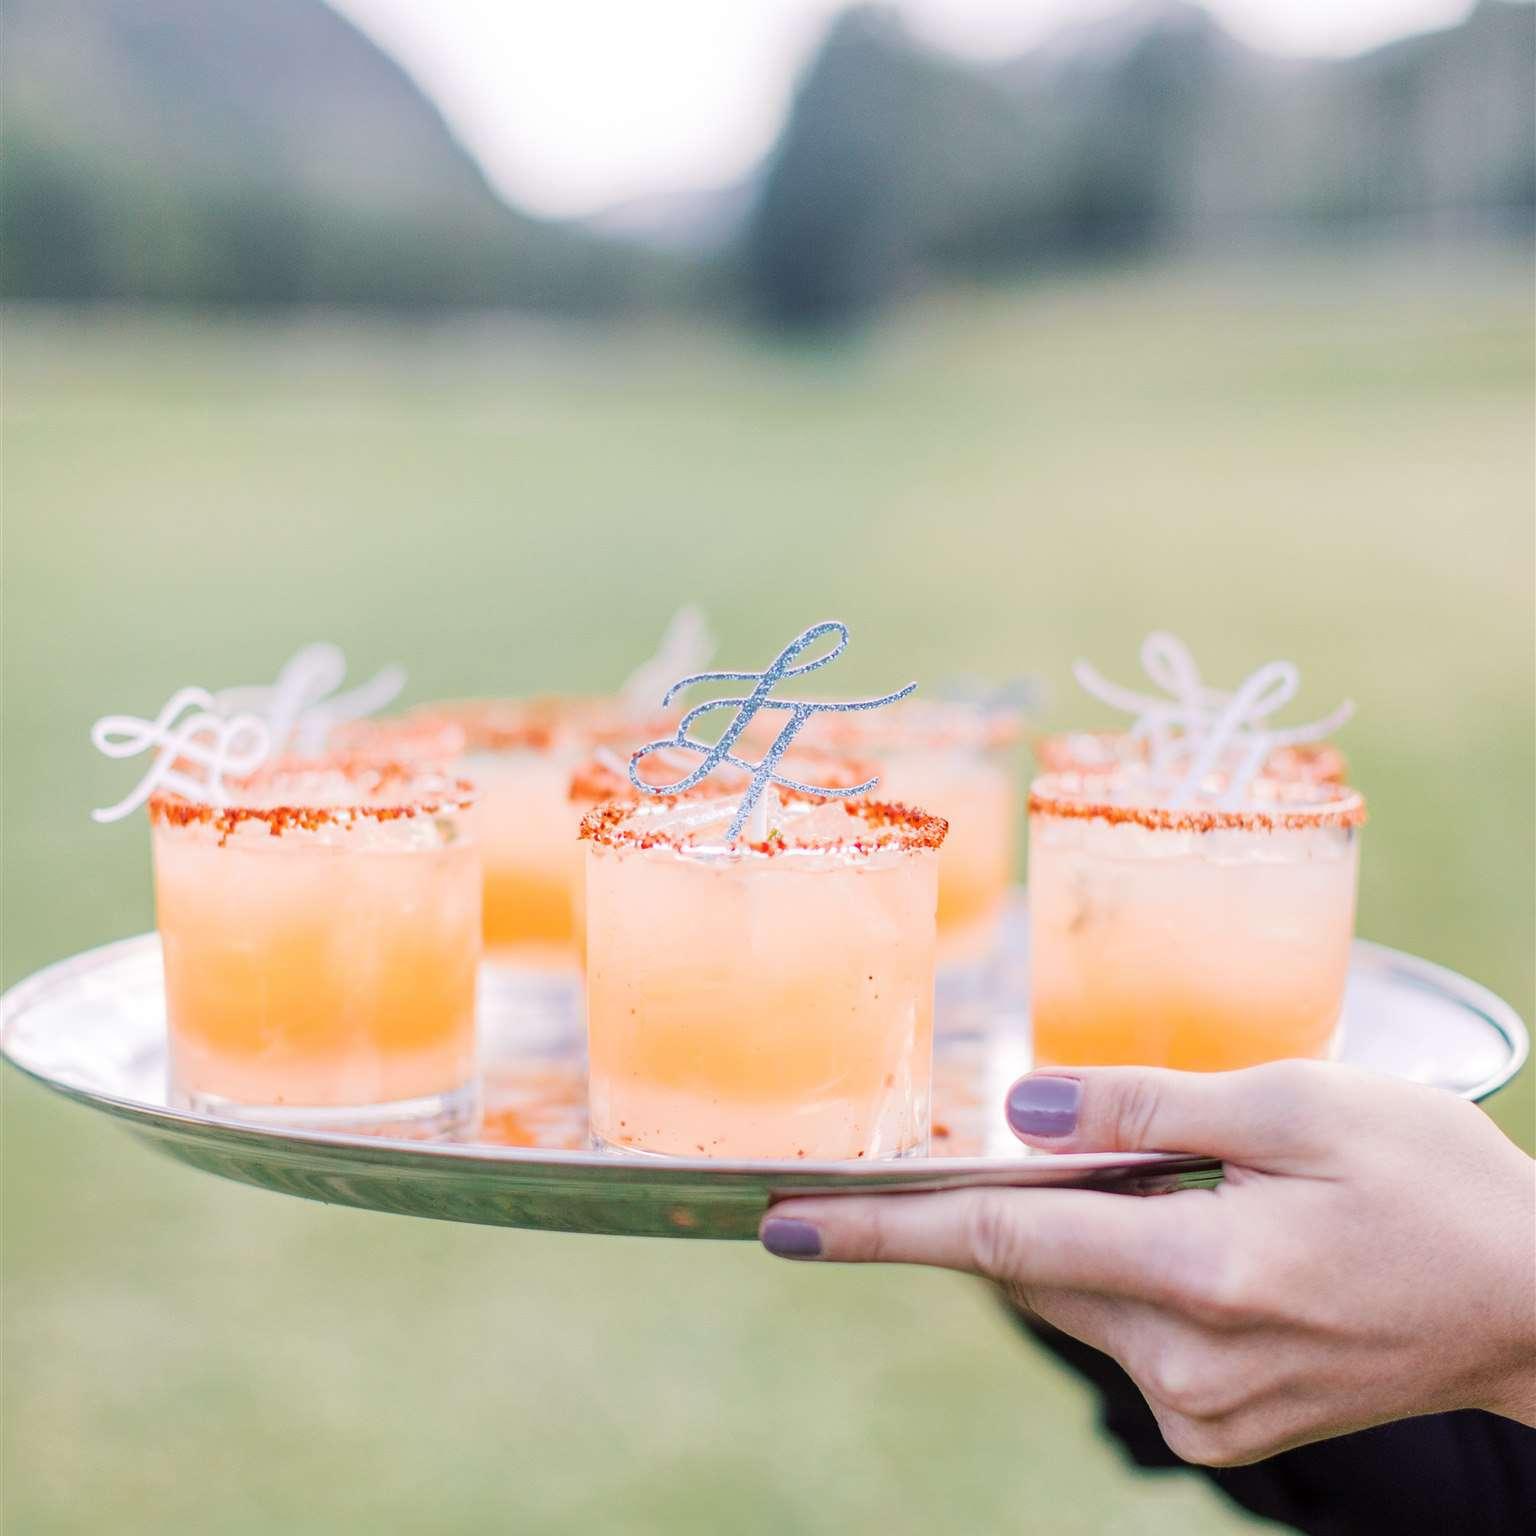 signature drinks with custom stirrers